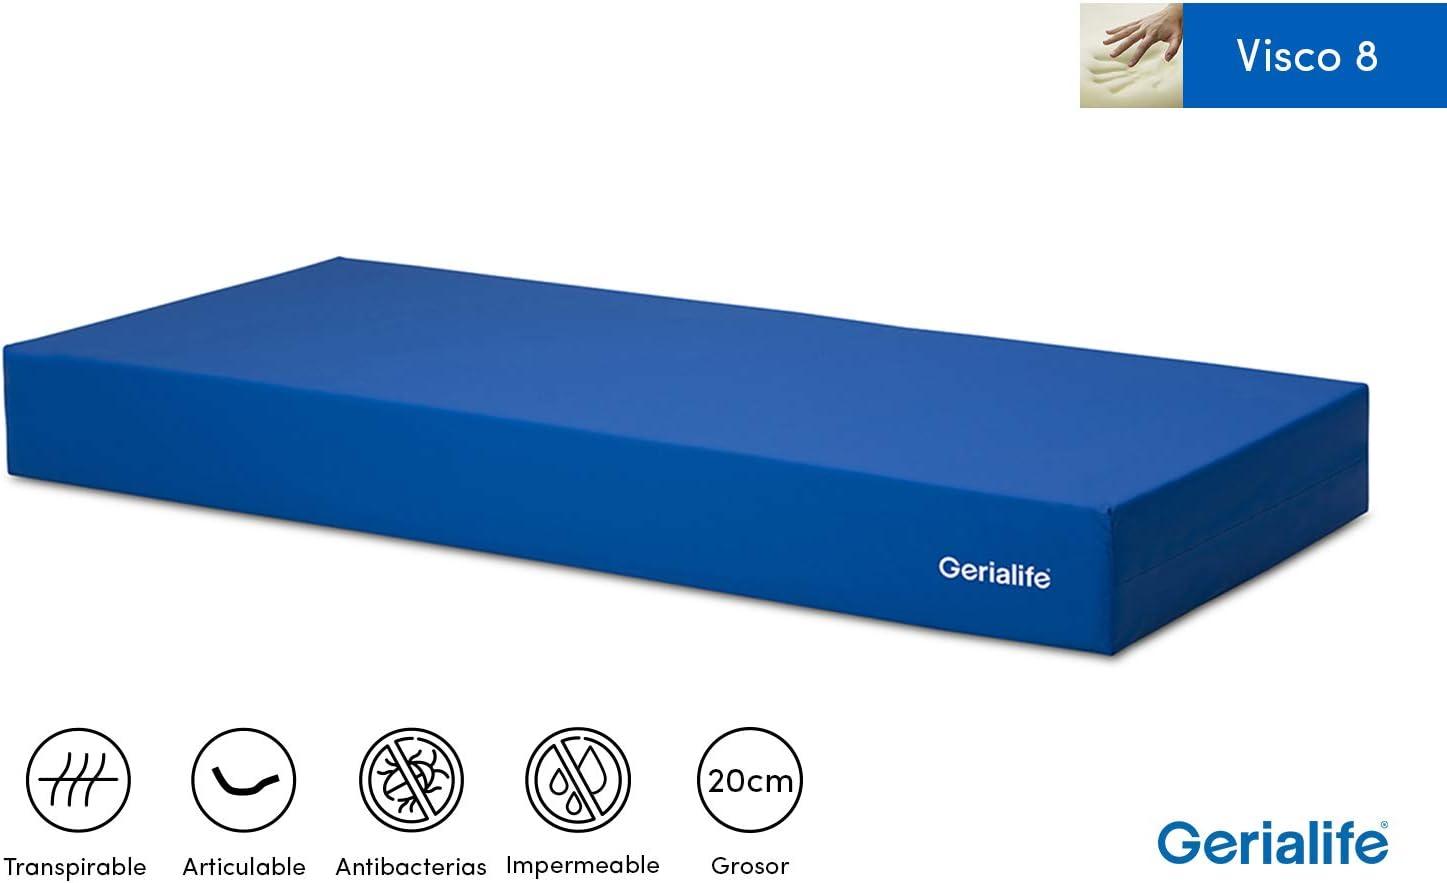 GERIALIFE Colchón Geriátrico Hospitalario Articulado   8 cm de Viscoelástica   Funda Sanitaria Impermeable (80x190)